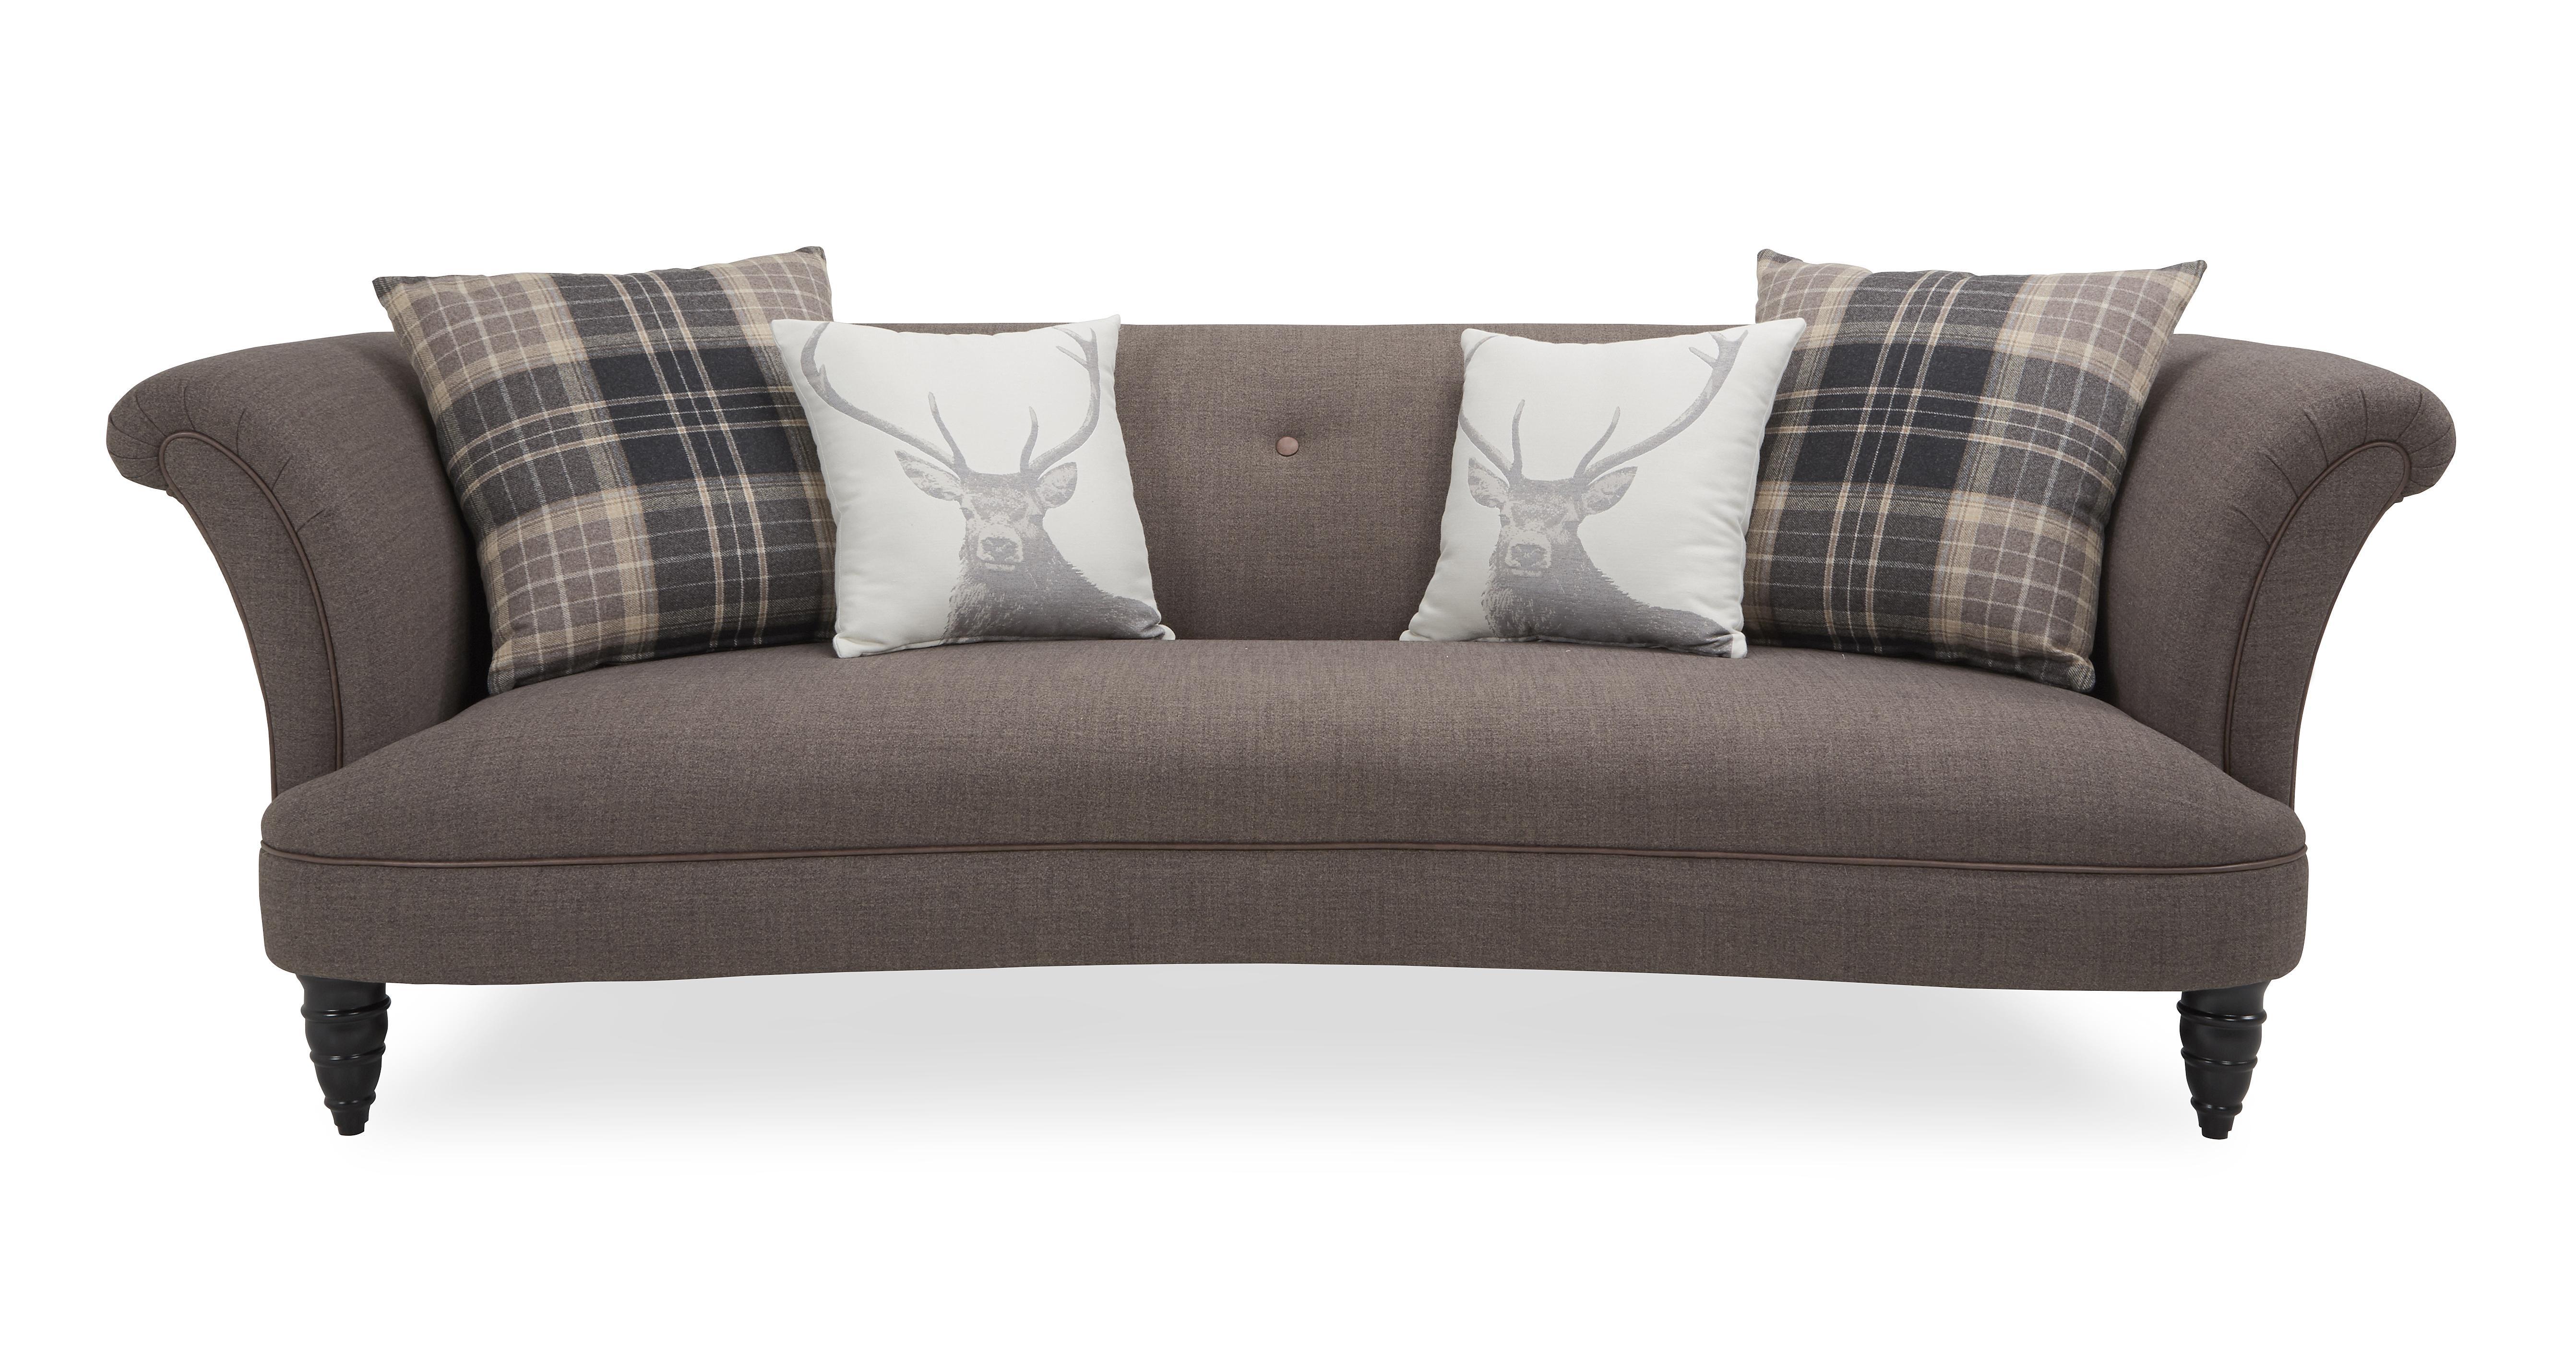 concerto 4 seater sofa alternative fabric moray dfs. Black Bedroom Furniture Sets. Home Design Ideas